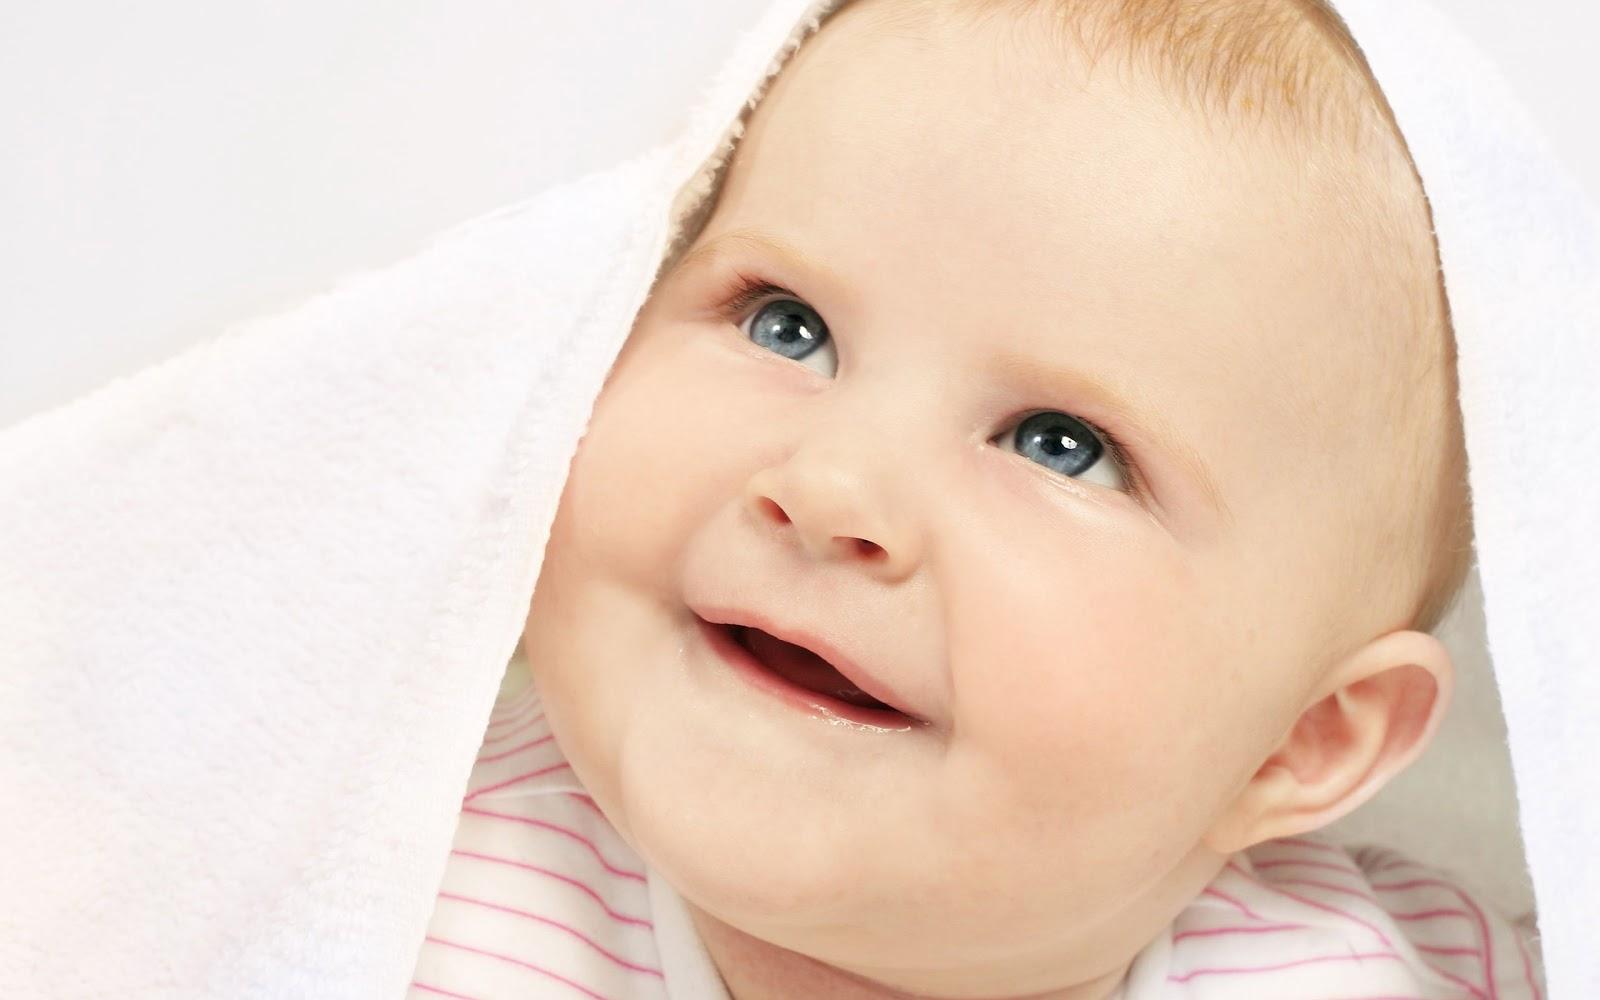 http://3.bp.blogspot.com/-eI_h9Ubvkbs/UNuxgKfeyCI/AAAAAAAAAYk/Eq6laEML8-4/s1600/Under-Blanket-Baby.jpg